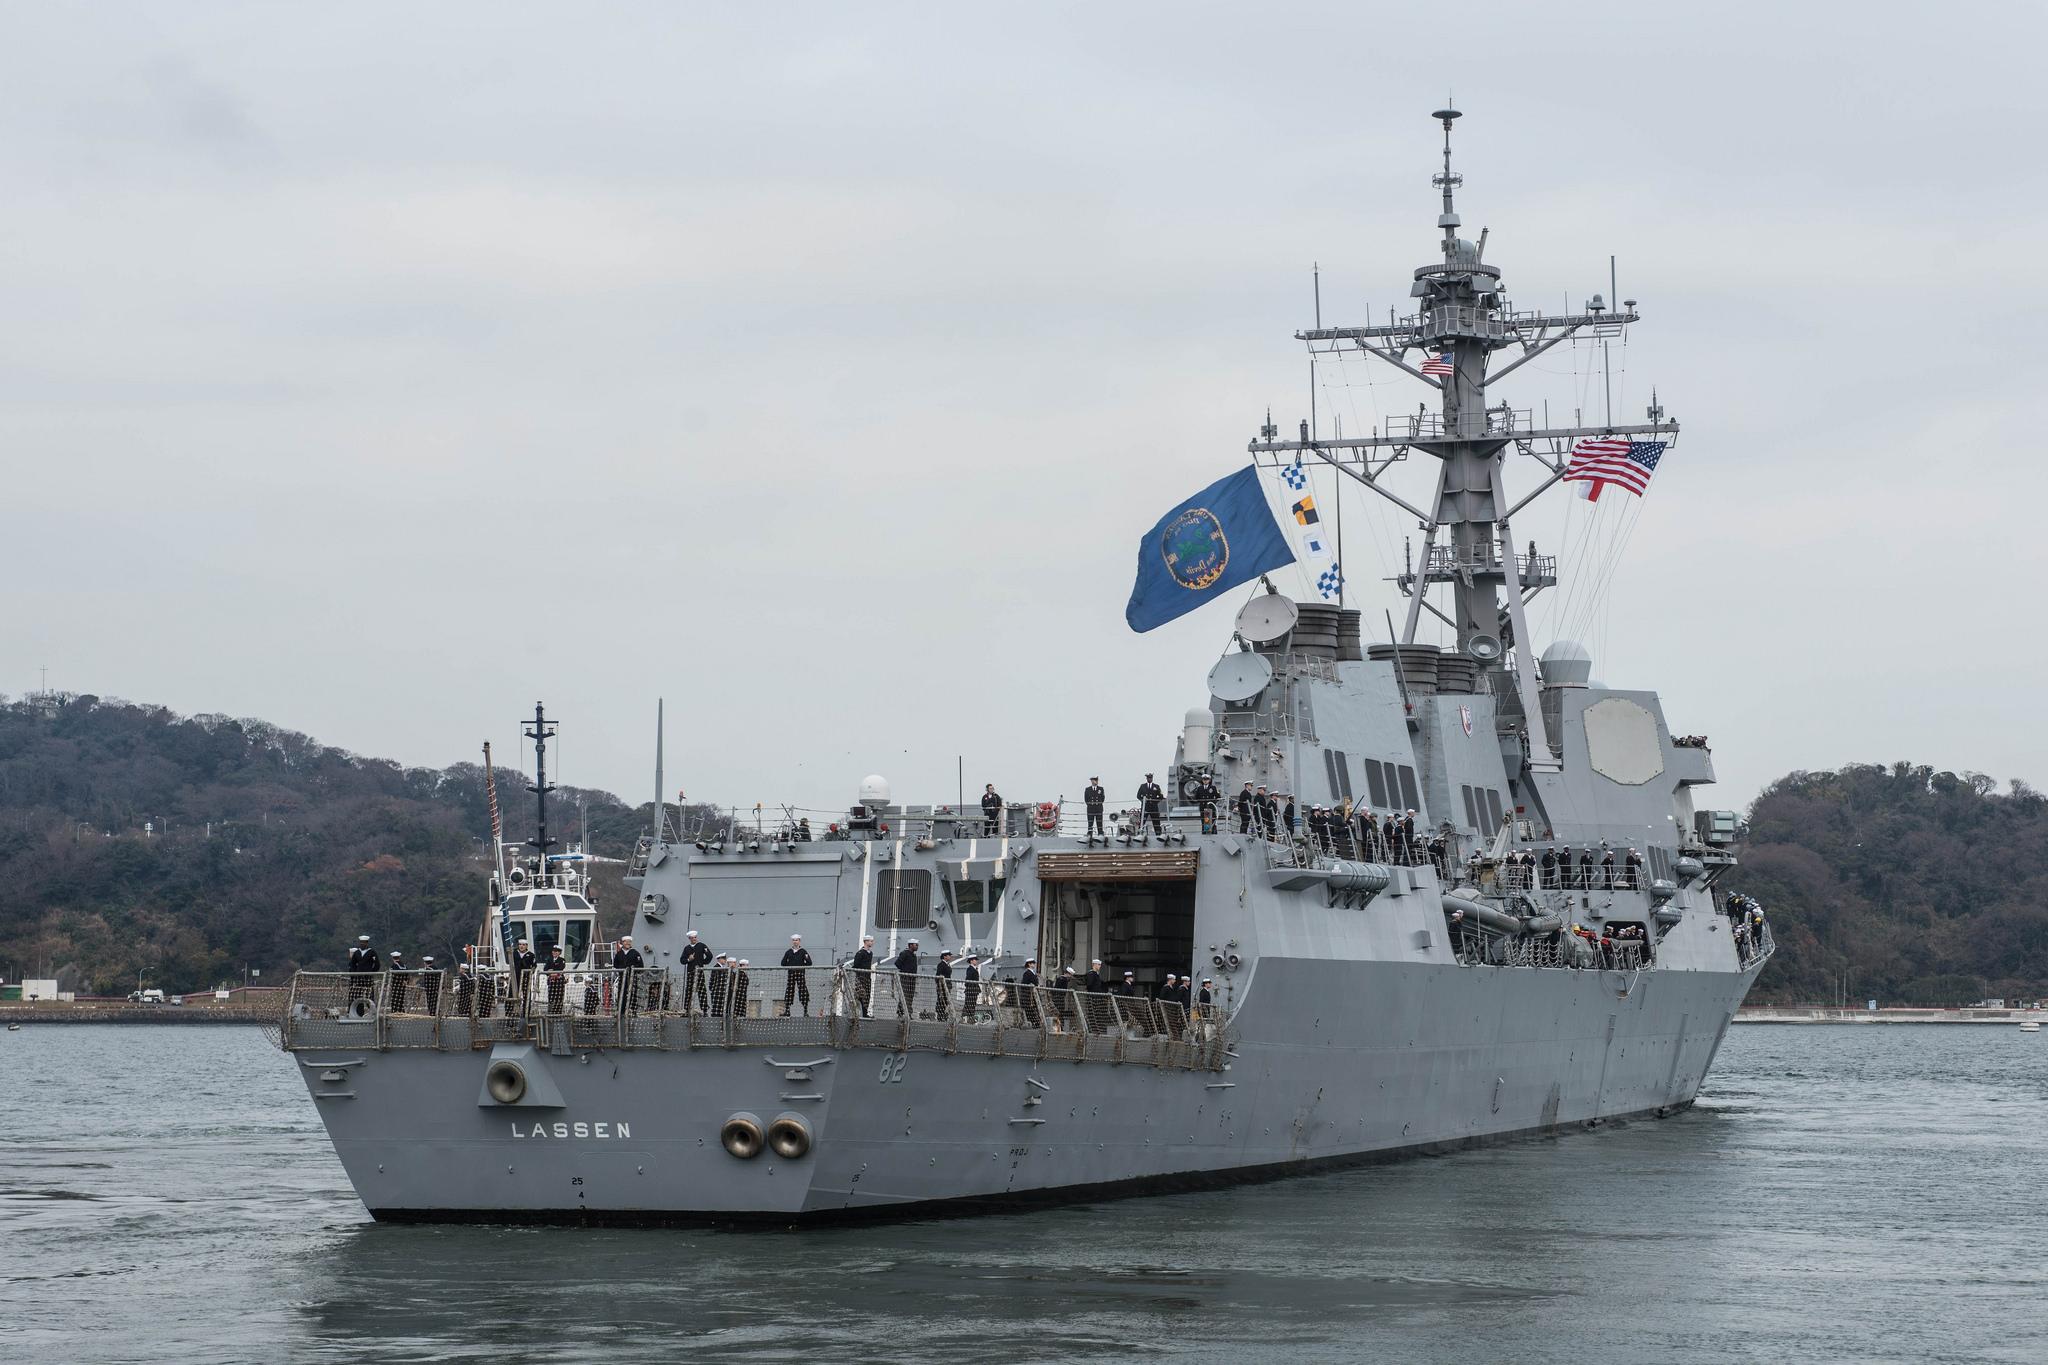 USS LASSEN DDG-82 Auslaufen Yokosuka am 06.01.2016 Bild: U.S. Navy